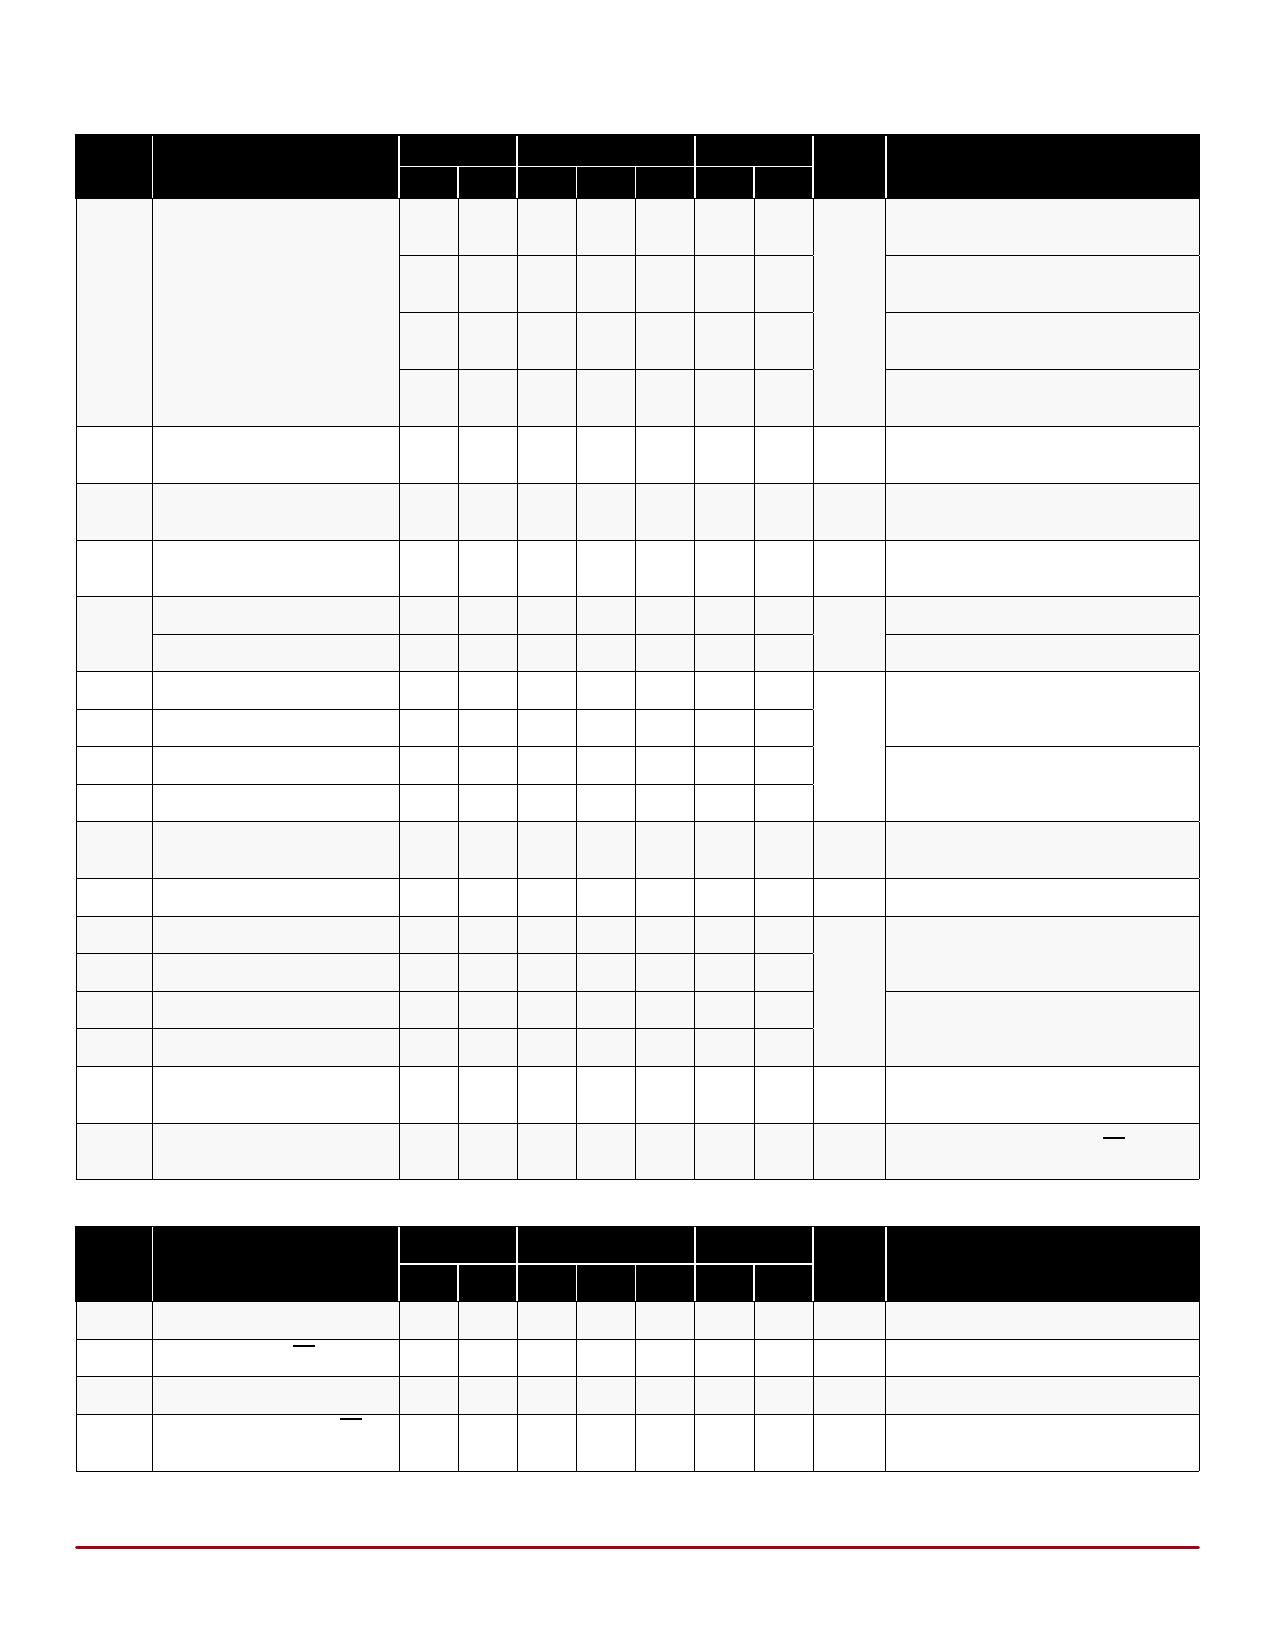 HV20822FG pdf, ピン配列